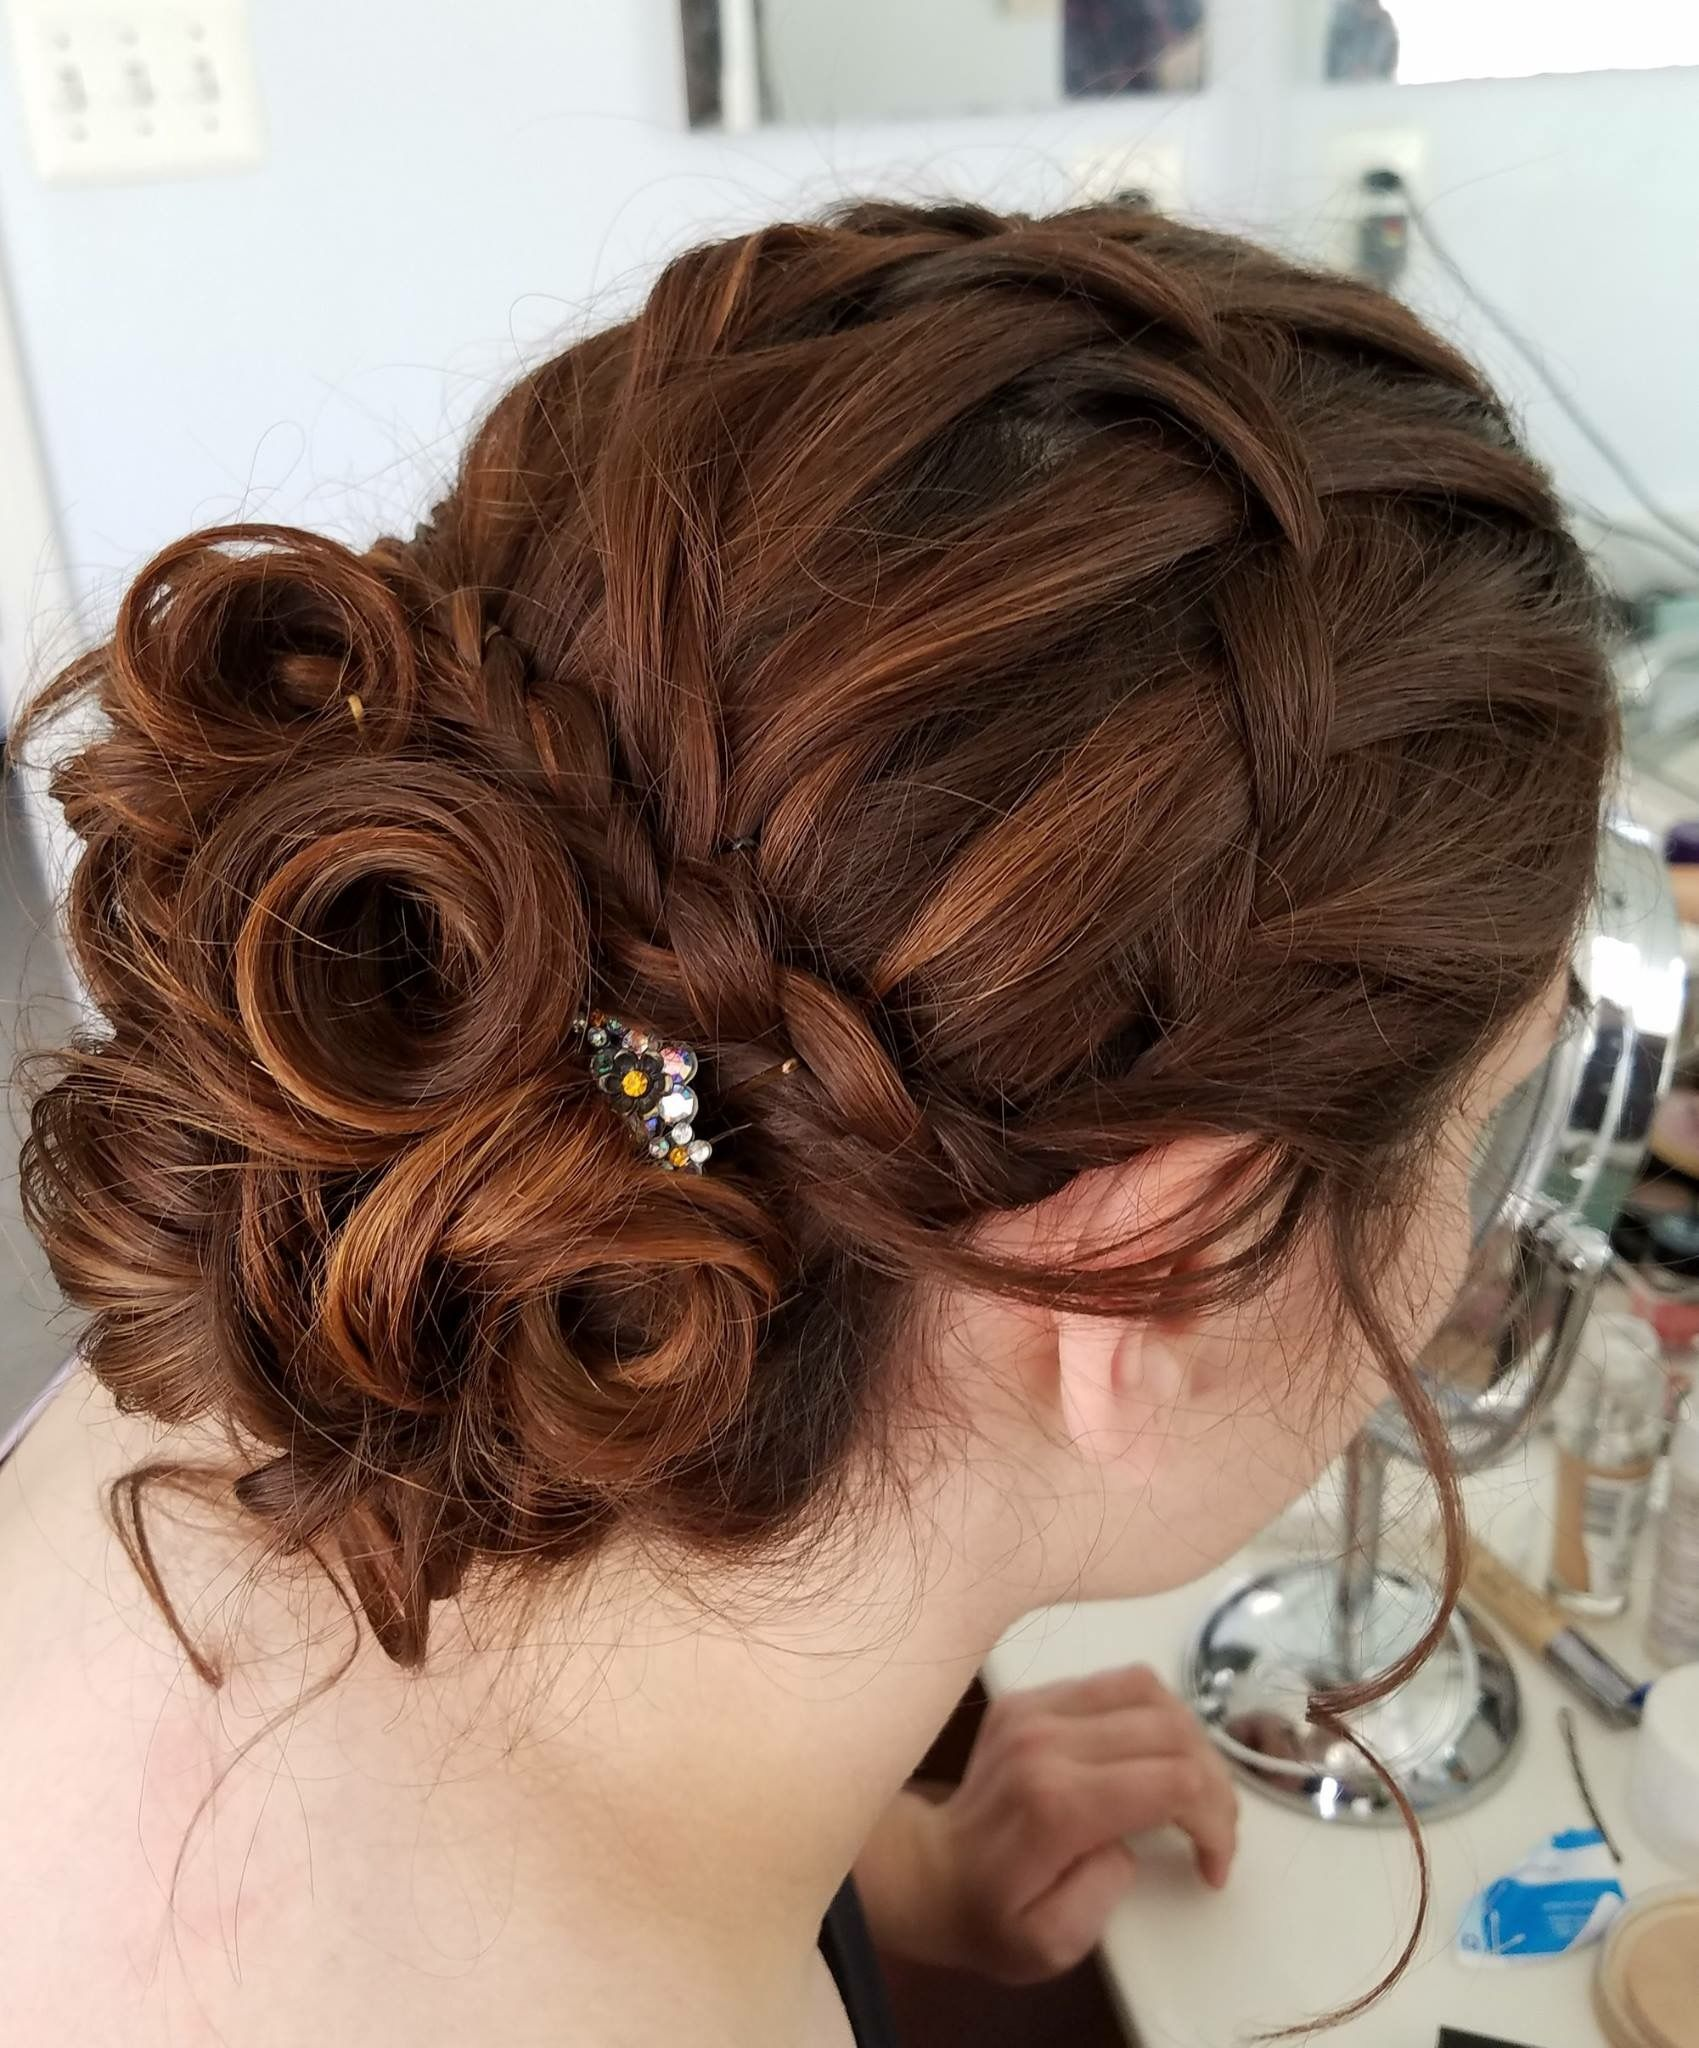 Prom Hair Low Bun Updo Bun Hairstyles Prom Hair Wedding Bun Hairstyles